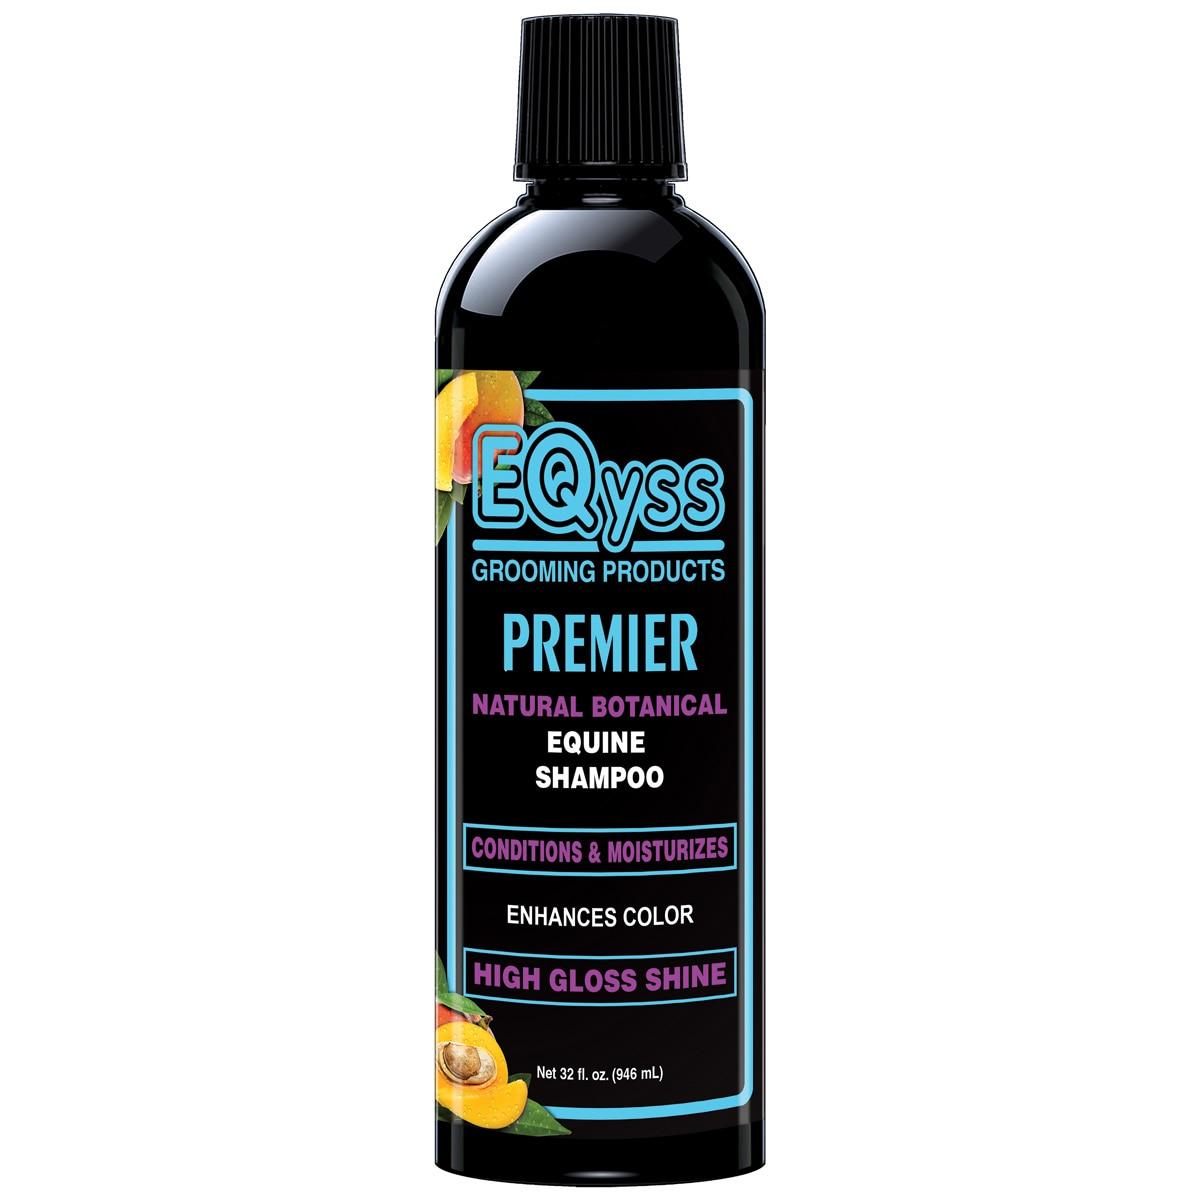 Eqyss Premier Shampoo